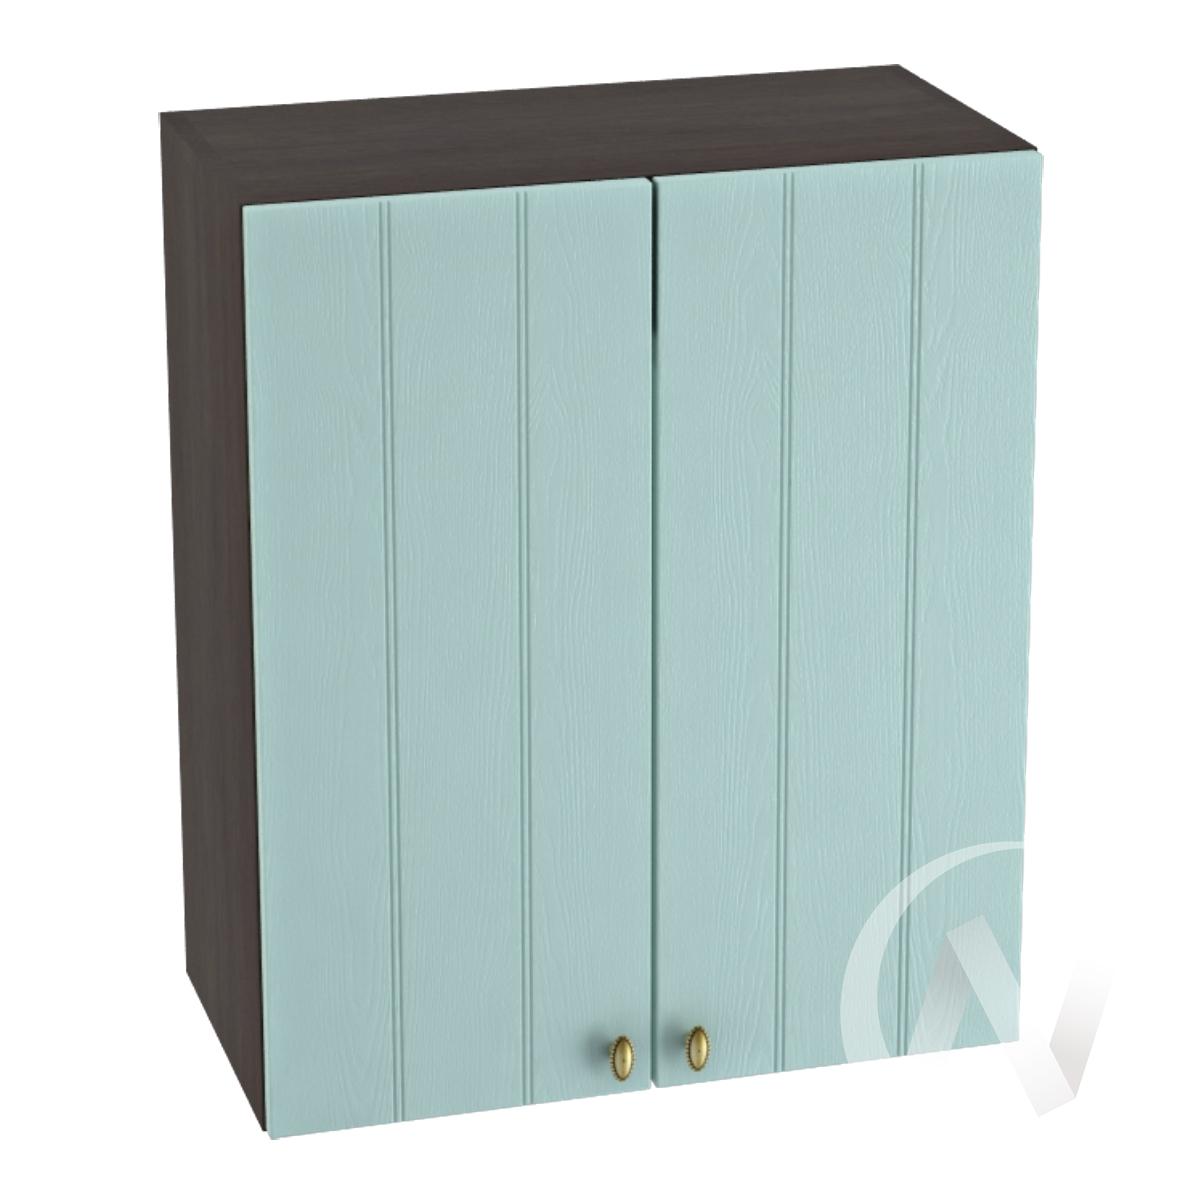 "Кухня ""Прованс"": Шкаф верхний 600, ШВ 600 (голубой/корпус венге)"